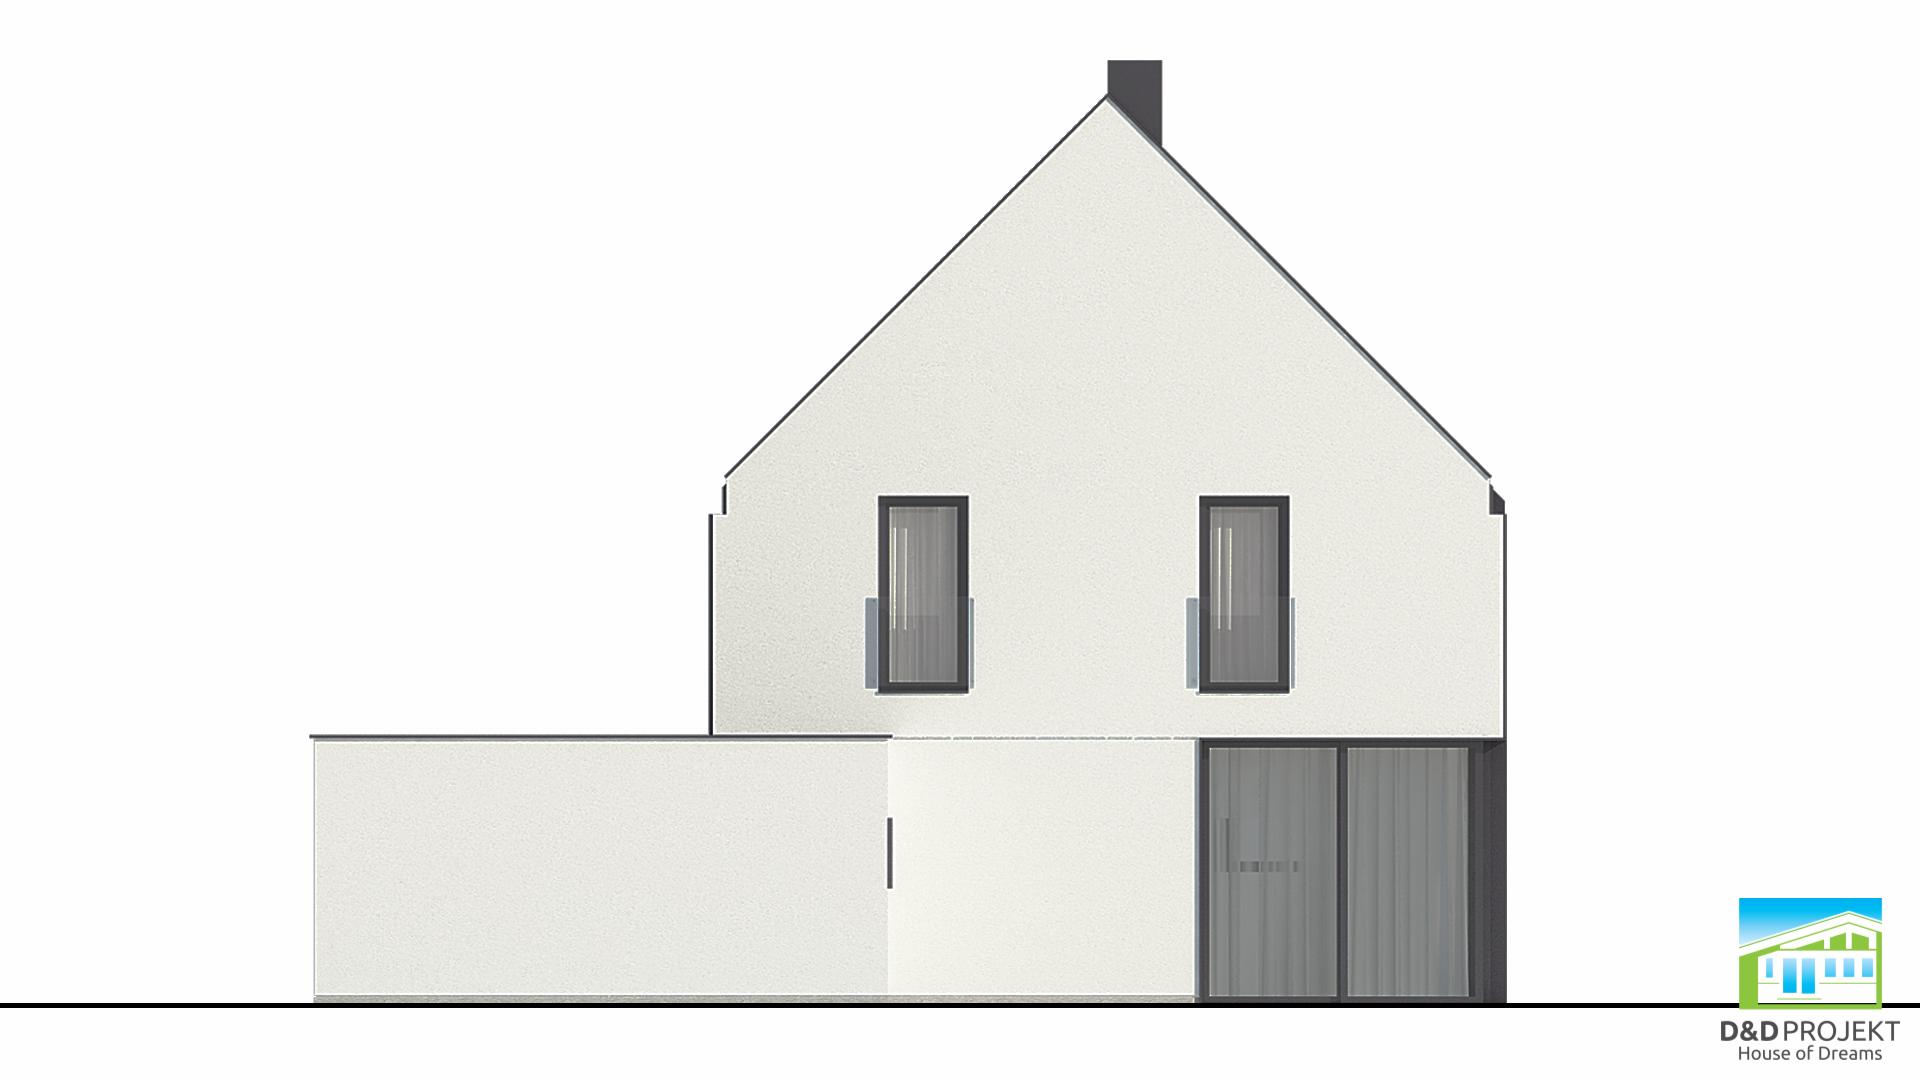 https://ddprojekt.pl/wp-content/uploads/2020/03/elewacja2.jpg